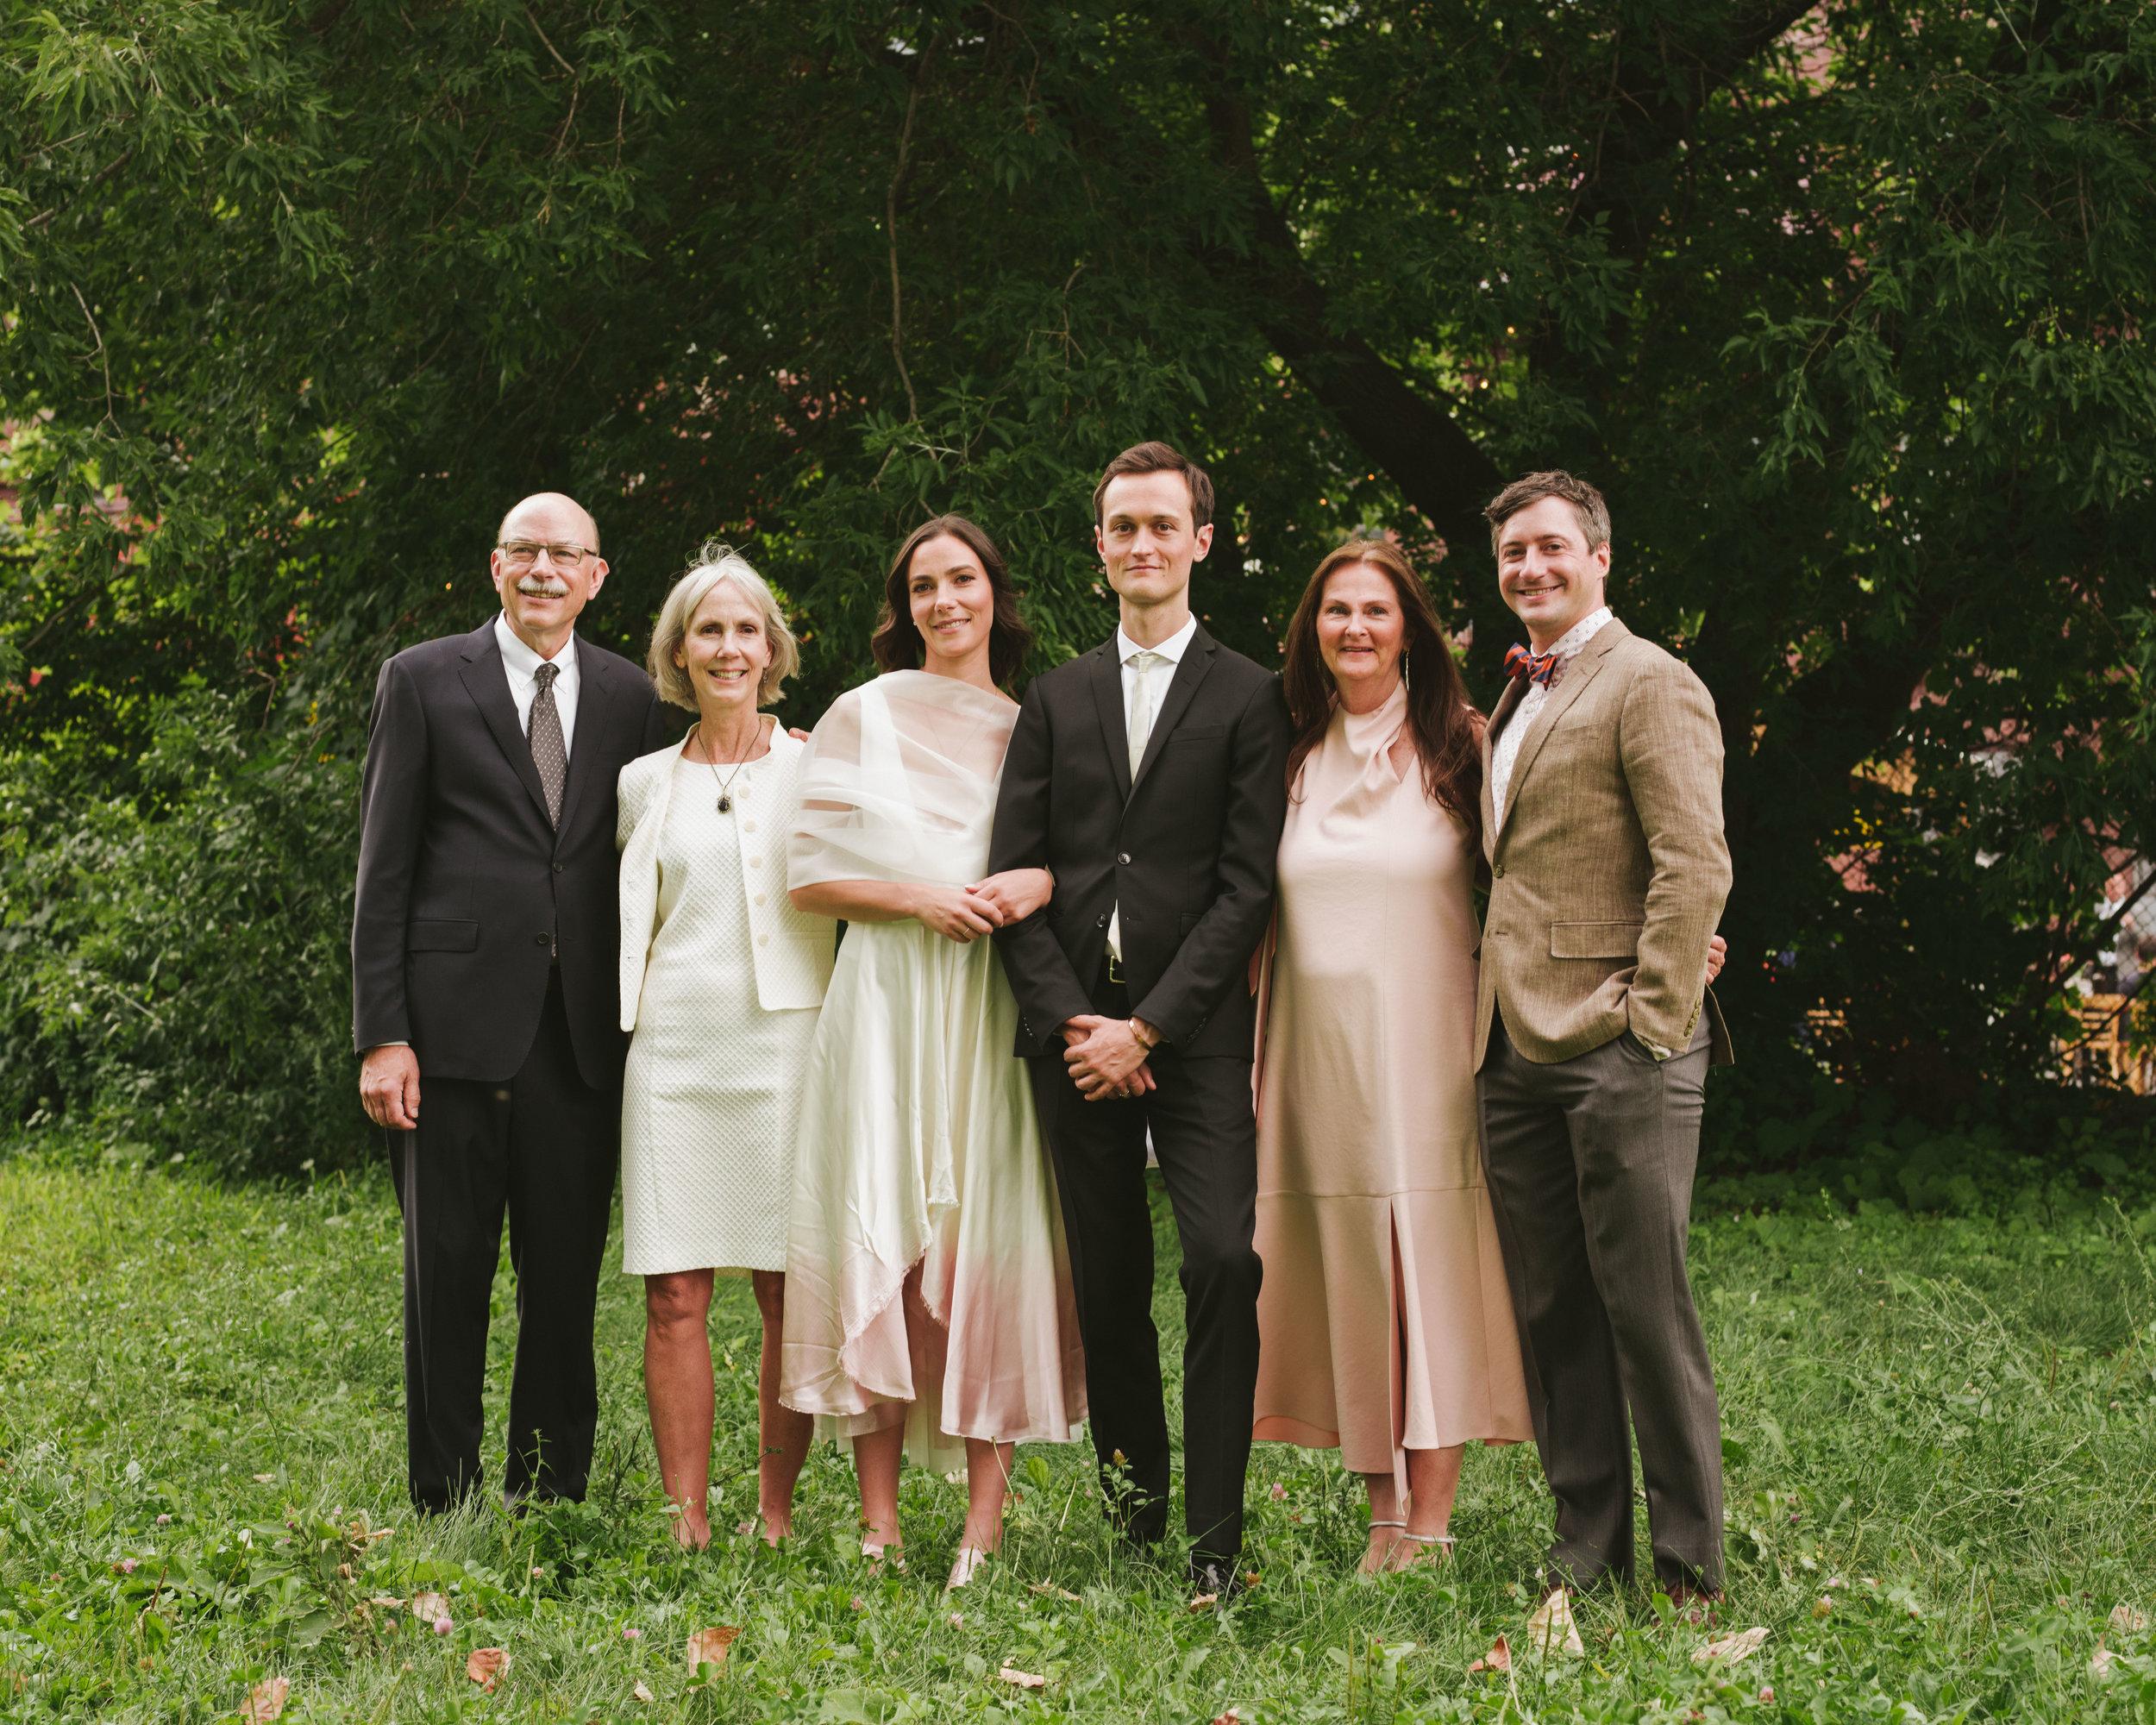 Tim-Darcy_Amy-Fort_Wedding_2019-9537.jpg